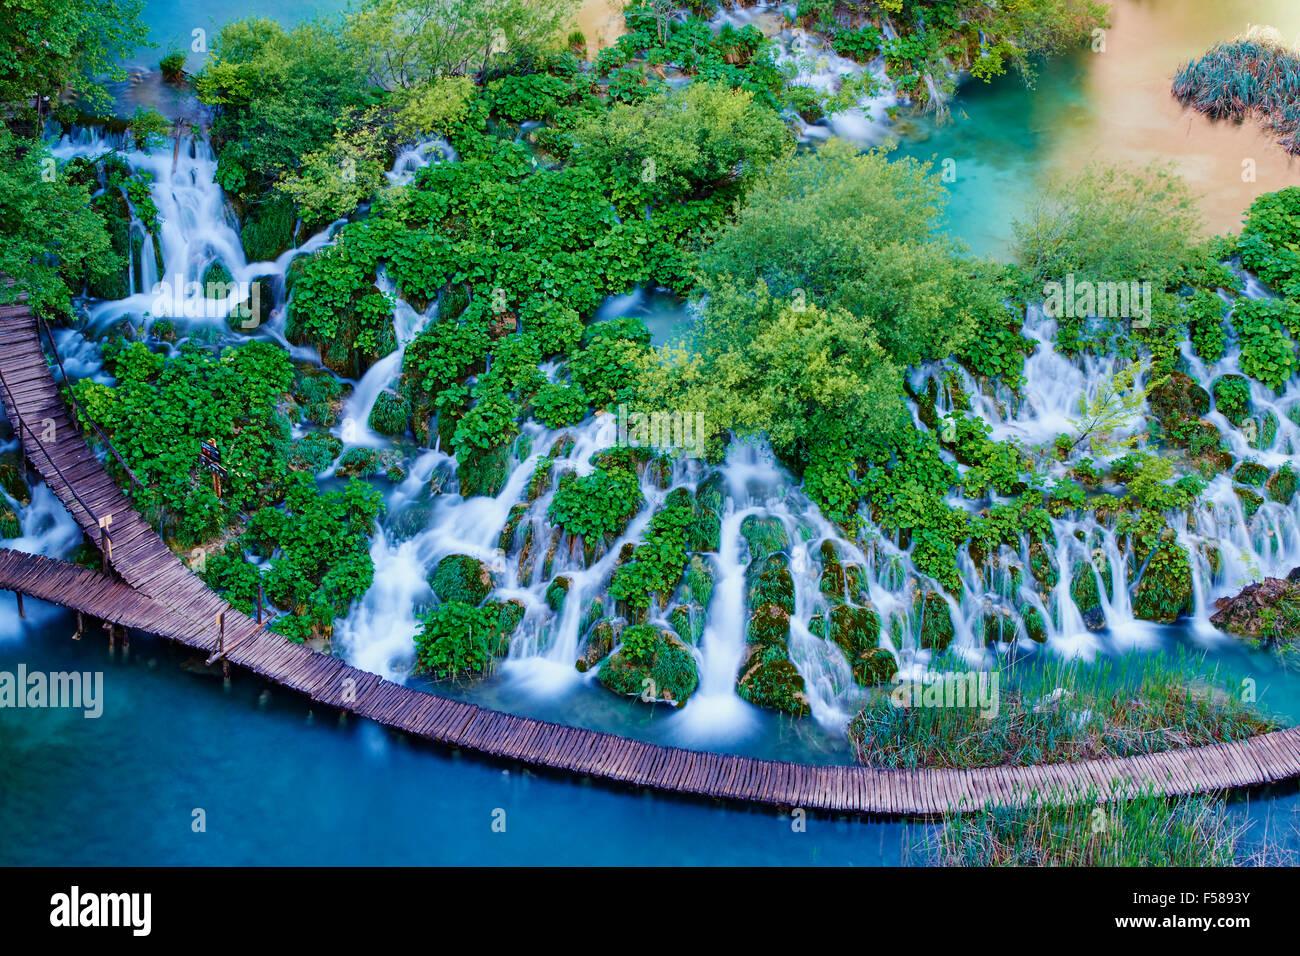 Croatia, Plitvice lakes National Park, Lower Lakes, Unesco World Heritage - Stock Image